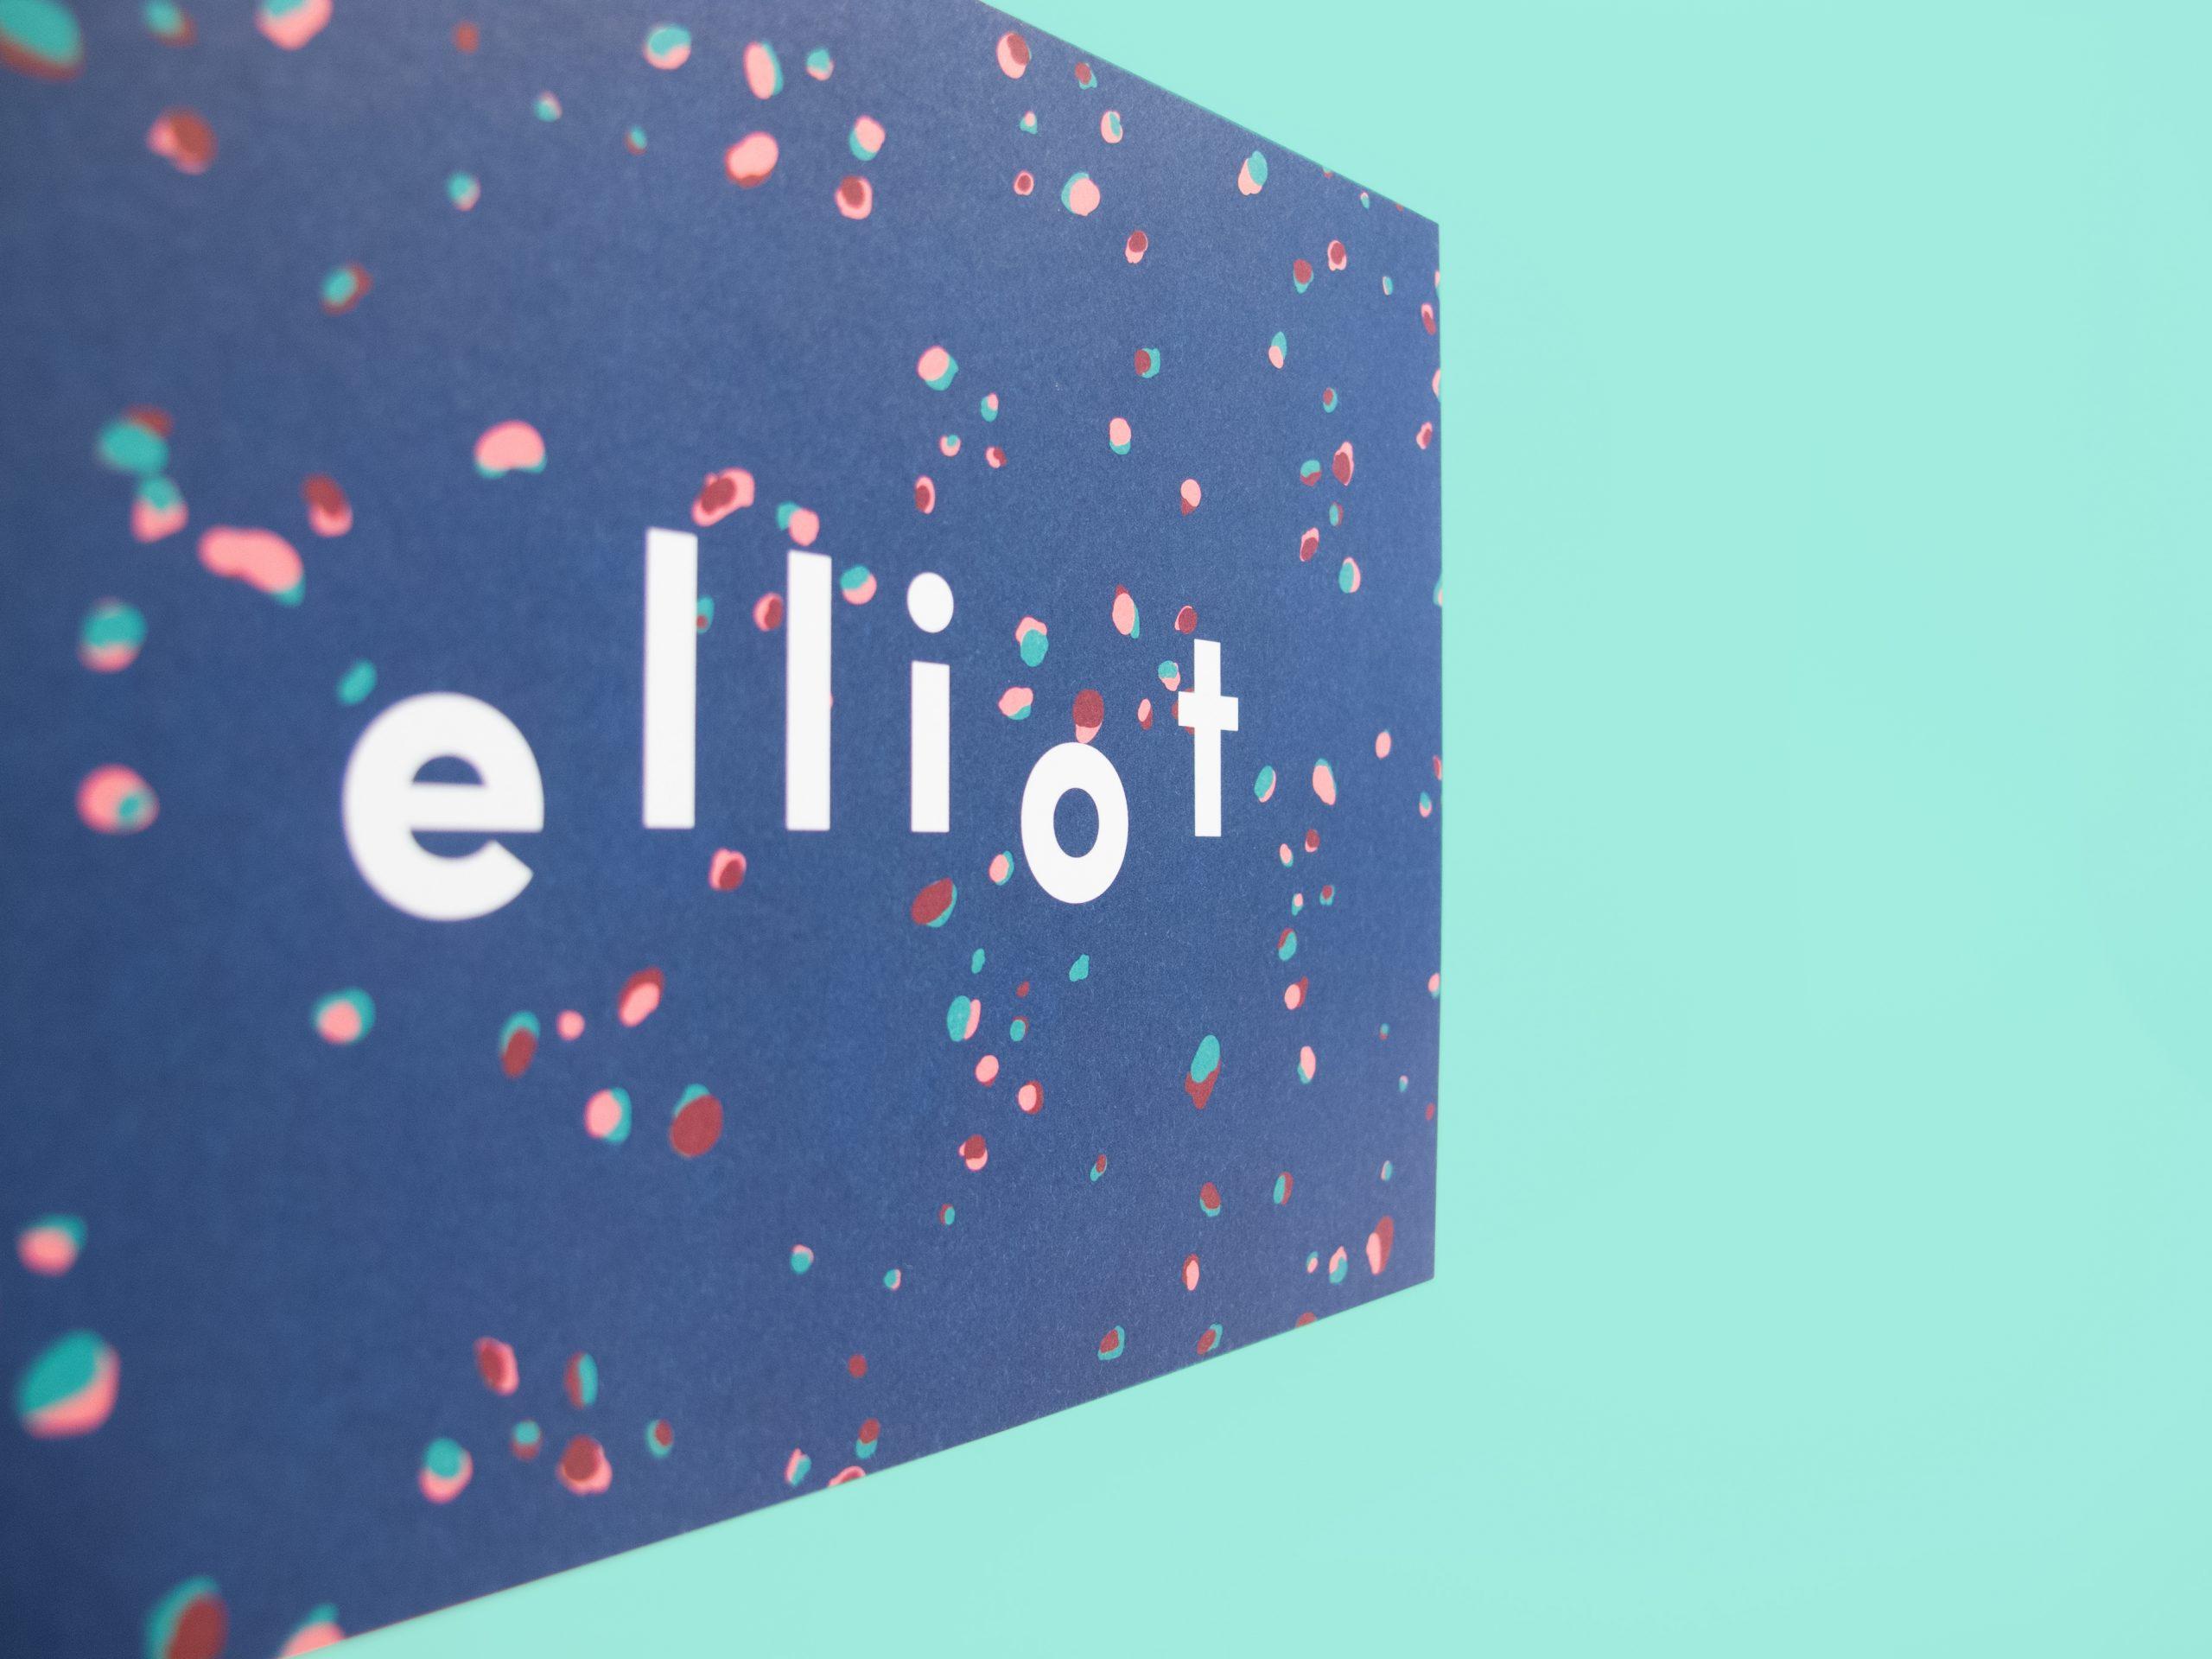 Elliot_3